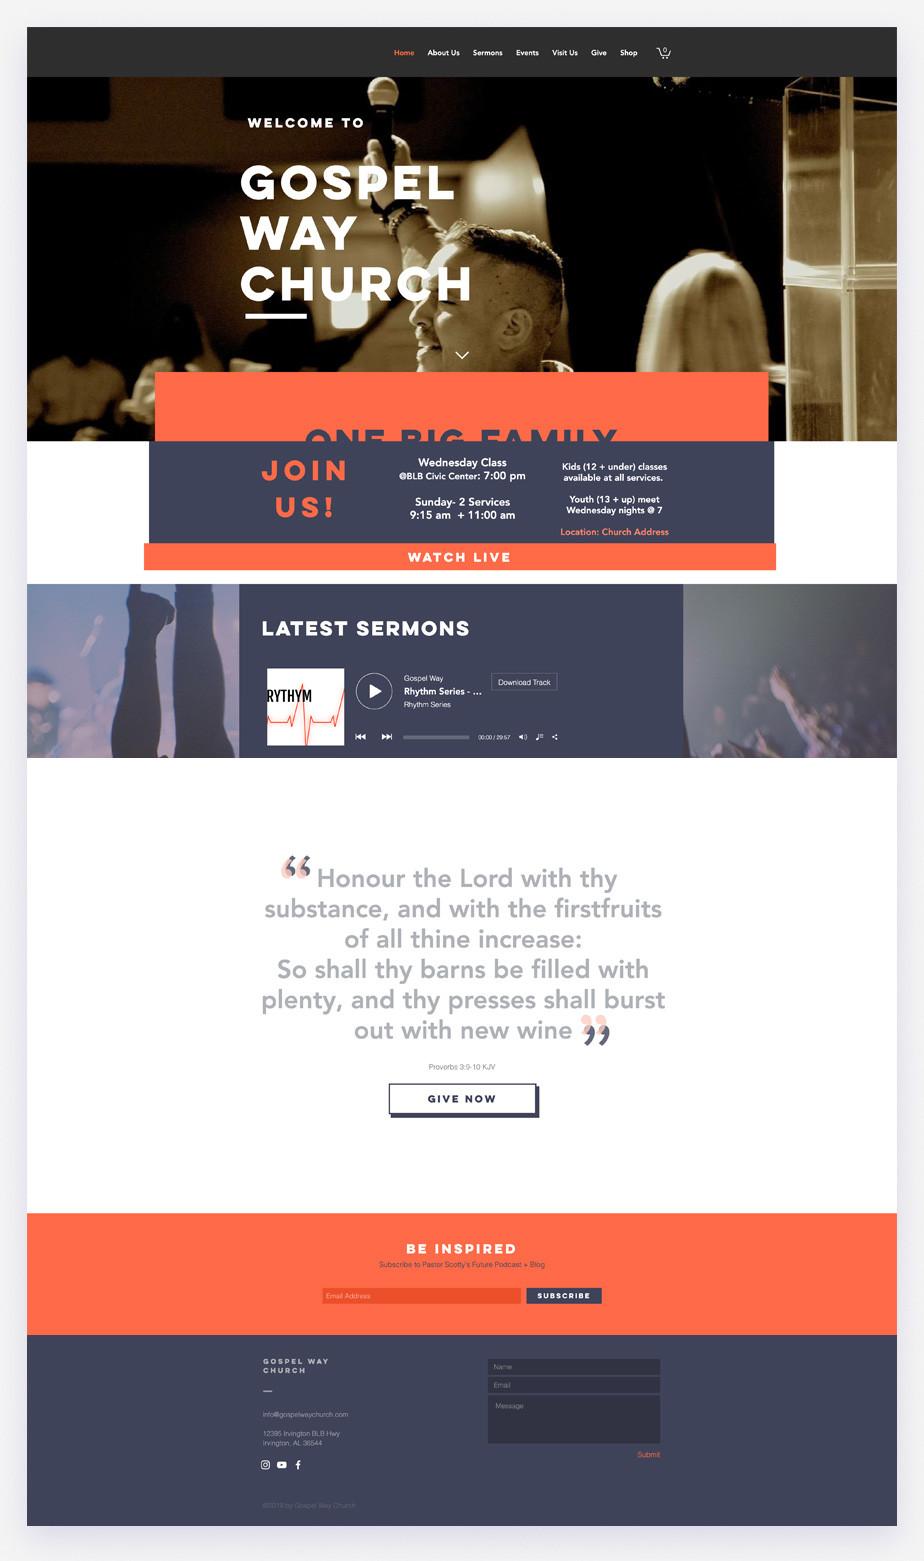 Best church websites example by Gospel Way Church